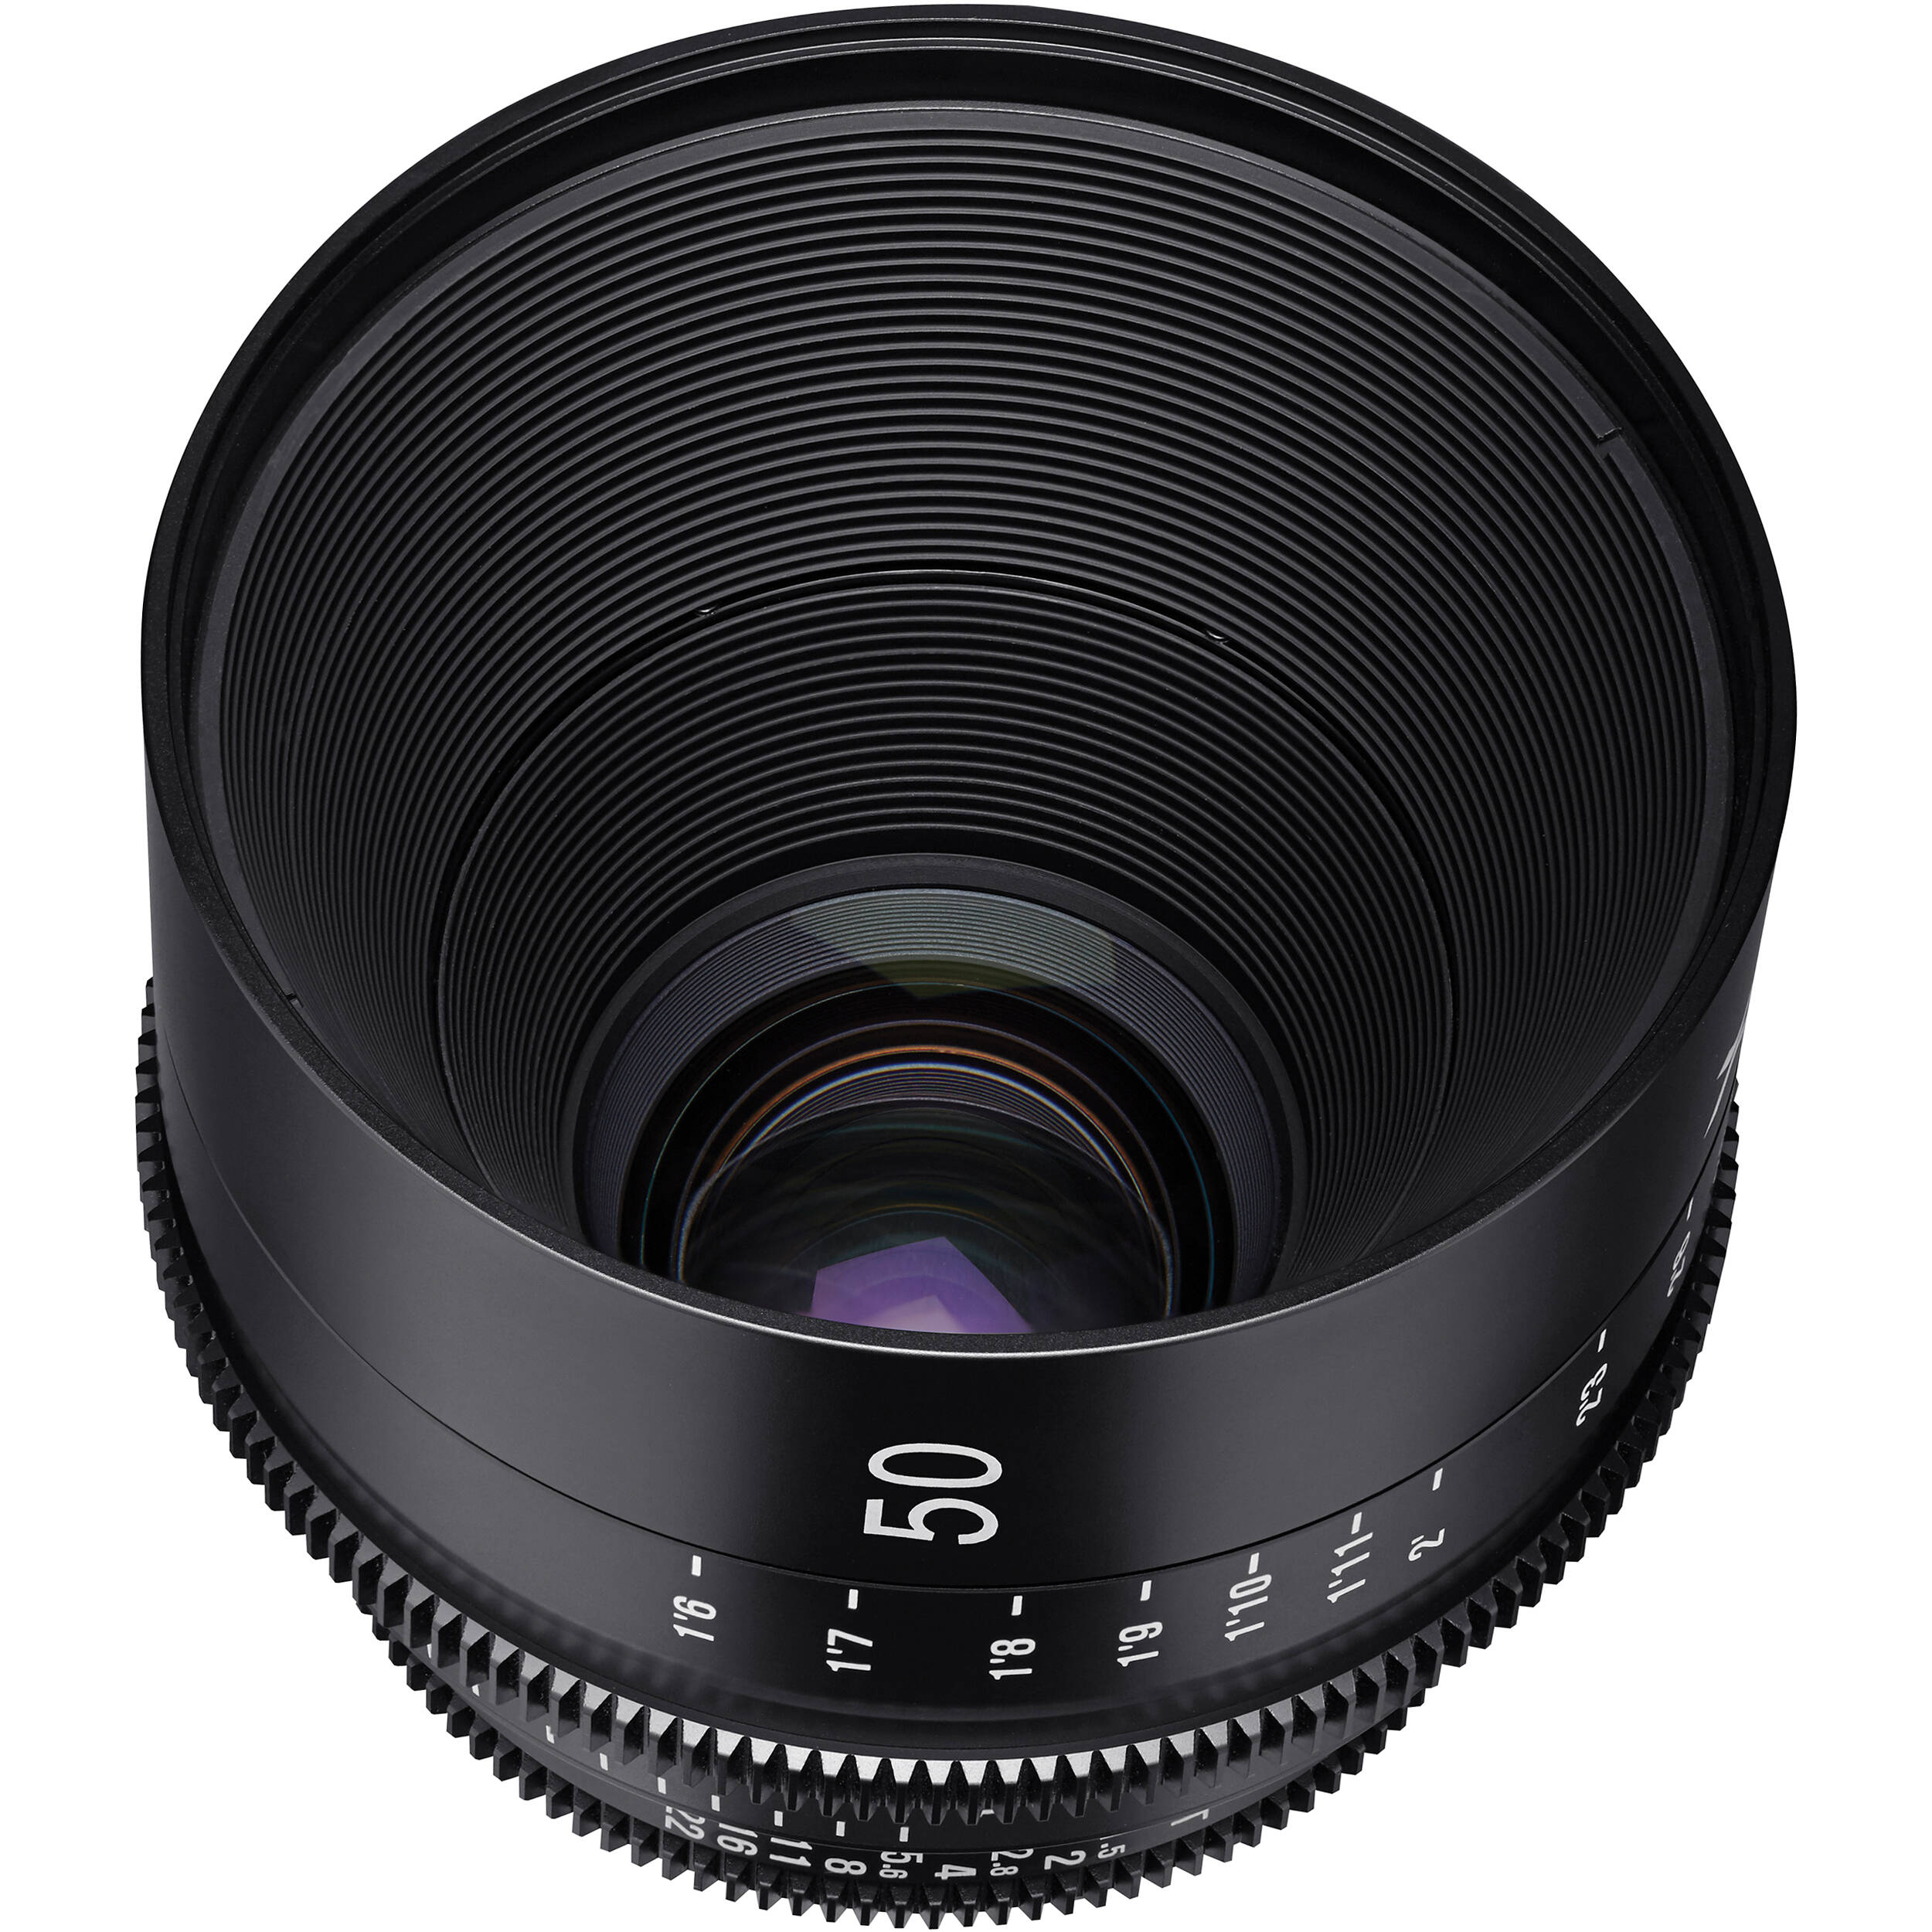 beb00e37a3a0 Rokinon Xeen 50mm T1.5 Lens for Nikon F Mount XN50-N B H Photo